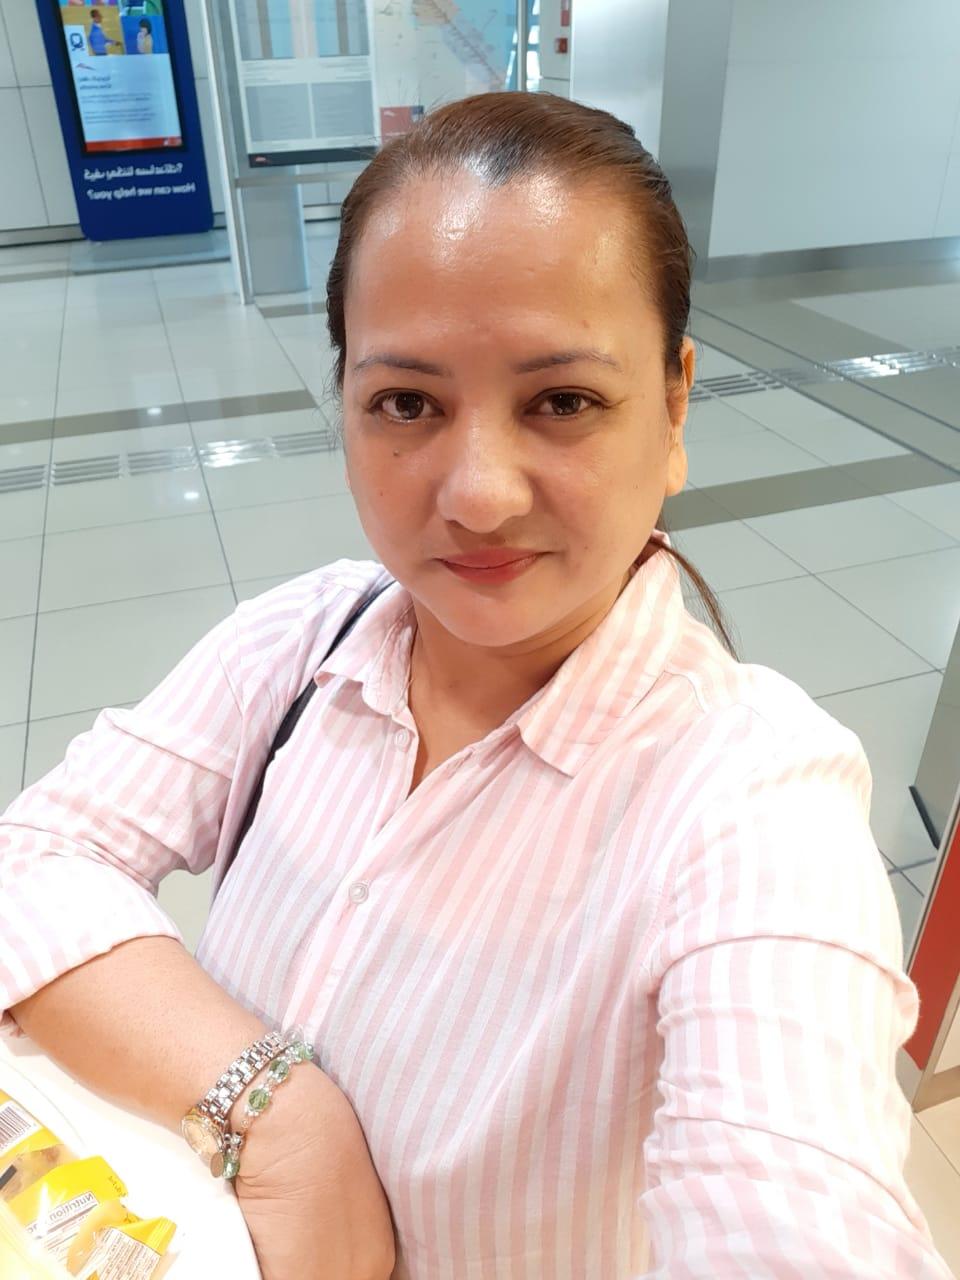 flordeliza zorilla batac photo_IM_2020102704074558.jpg